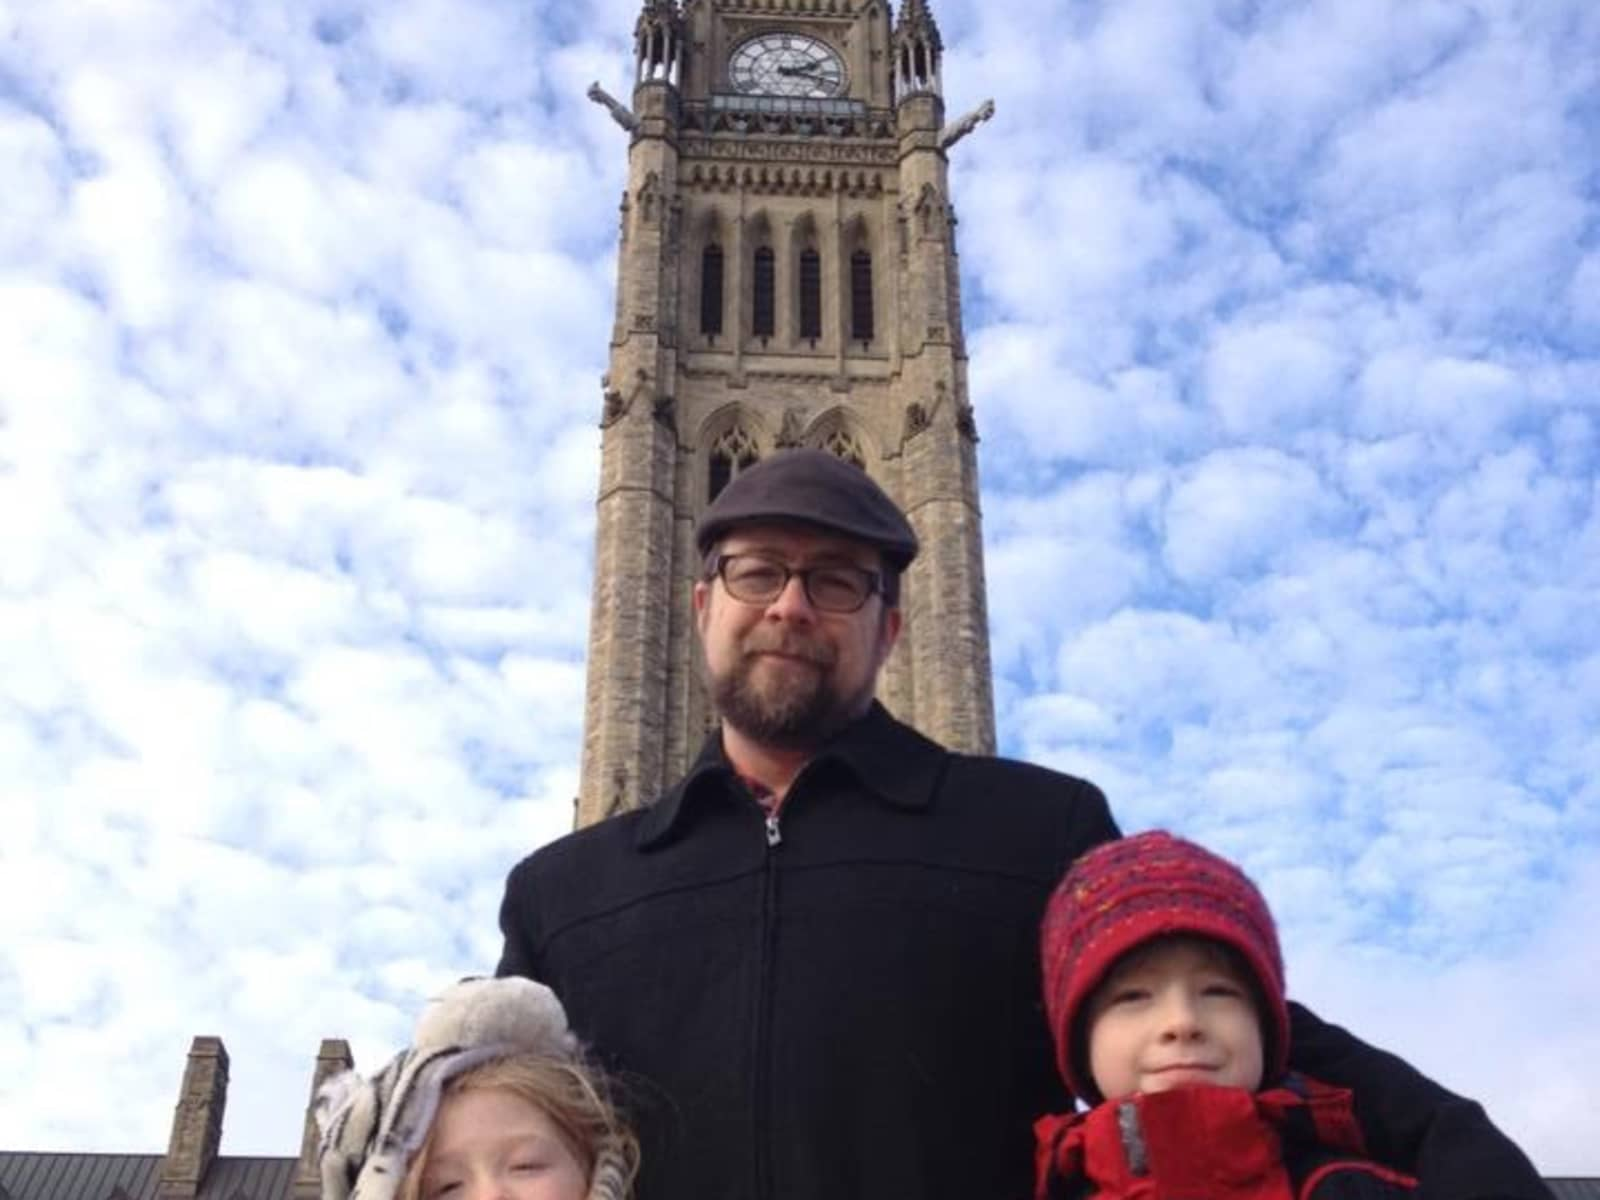 Erin & Joe from Ottawa, Ontario, Canada